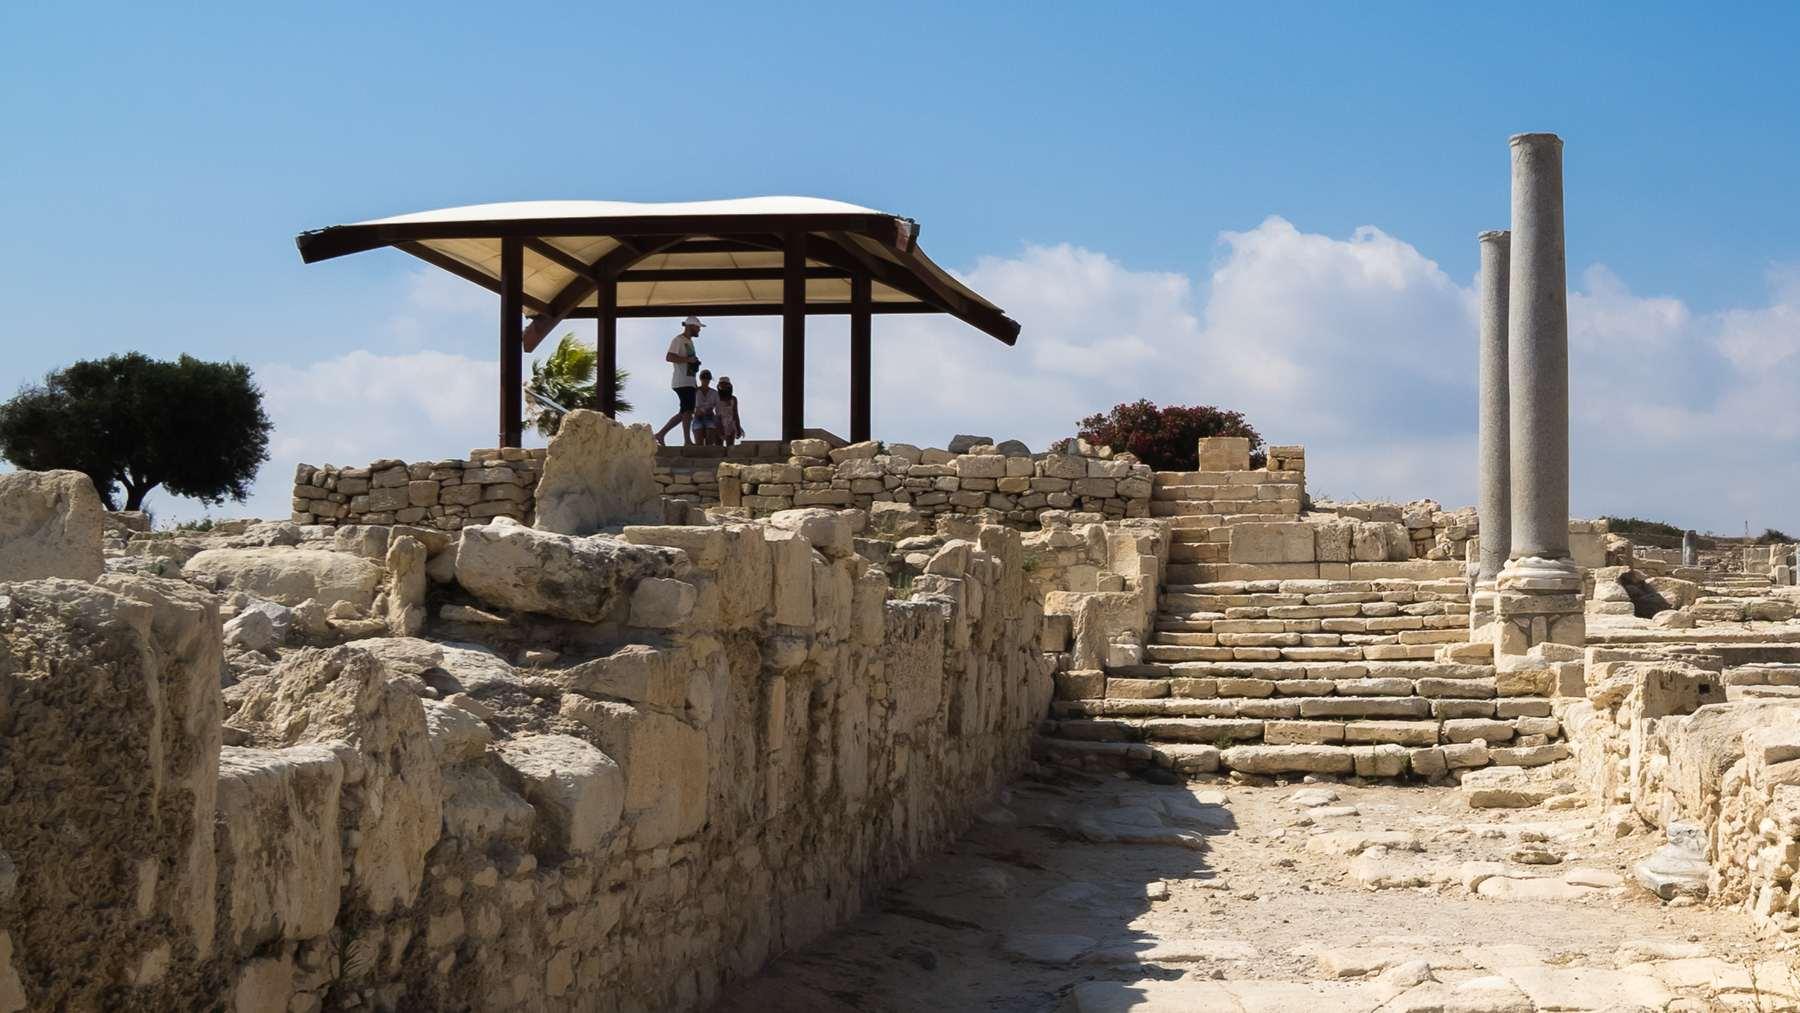 Епископская базилика в Курионе на Кипре